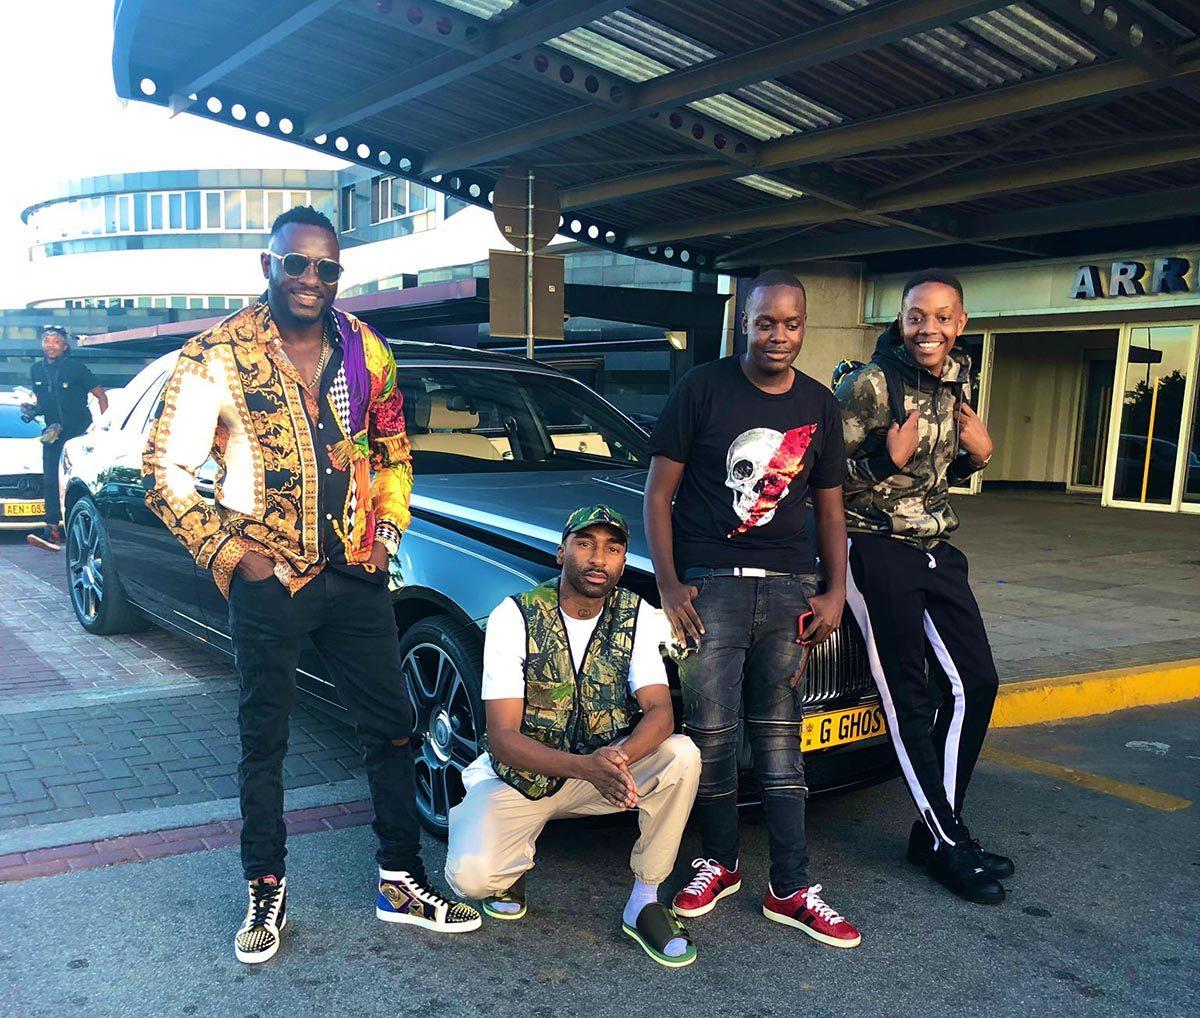 Risking all ... Riky Rick (crouching) and Chatunga (far right) wear camouflage at the Robert Gabriel Mugabe International Airport (Picture: Riky Rick/Twitter)